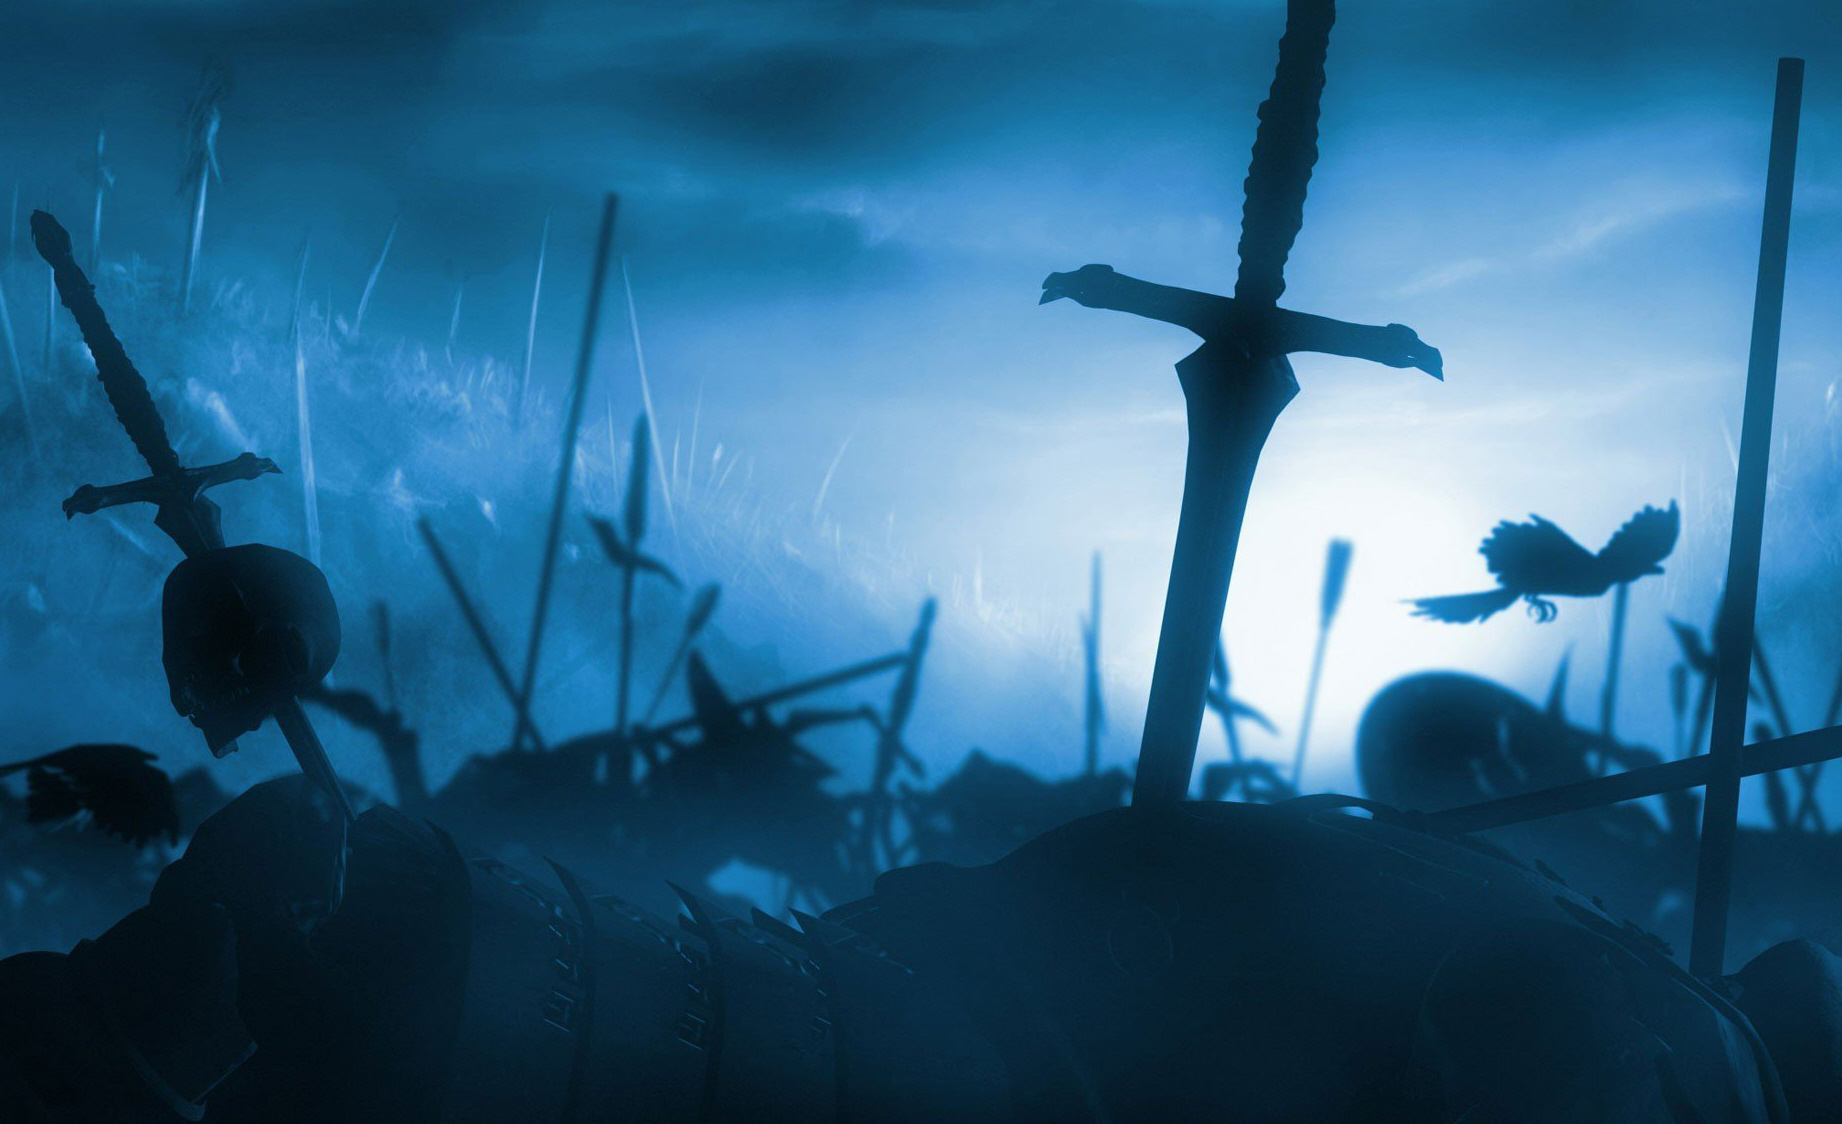 ARMAGEDDON: The Final Supernatural Showdown! - photo#46